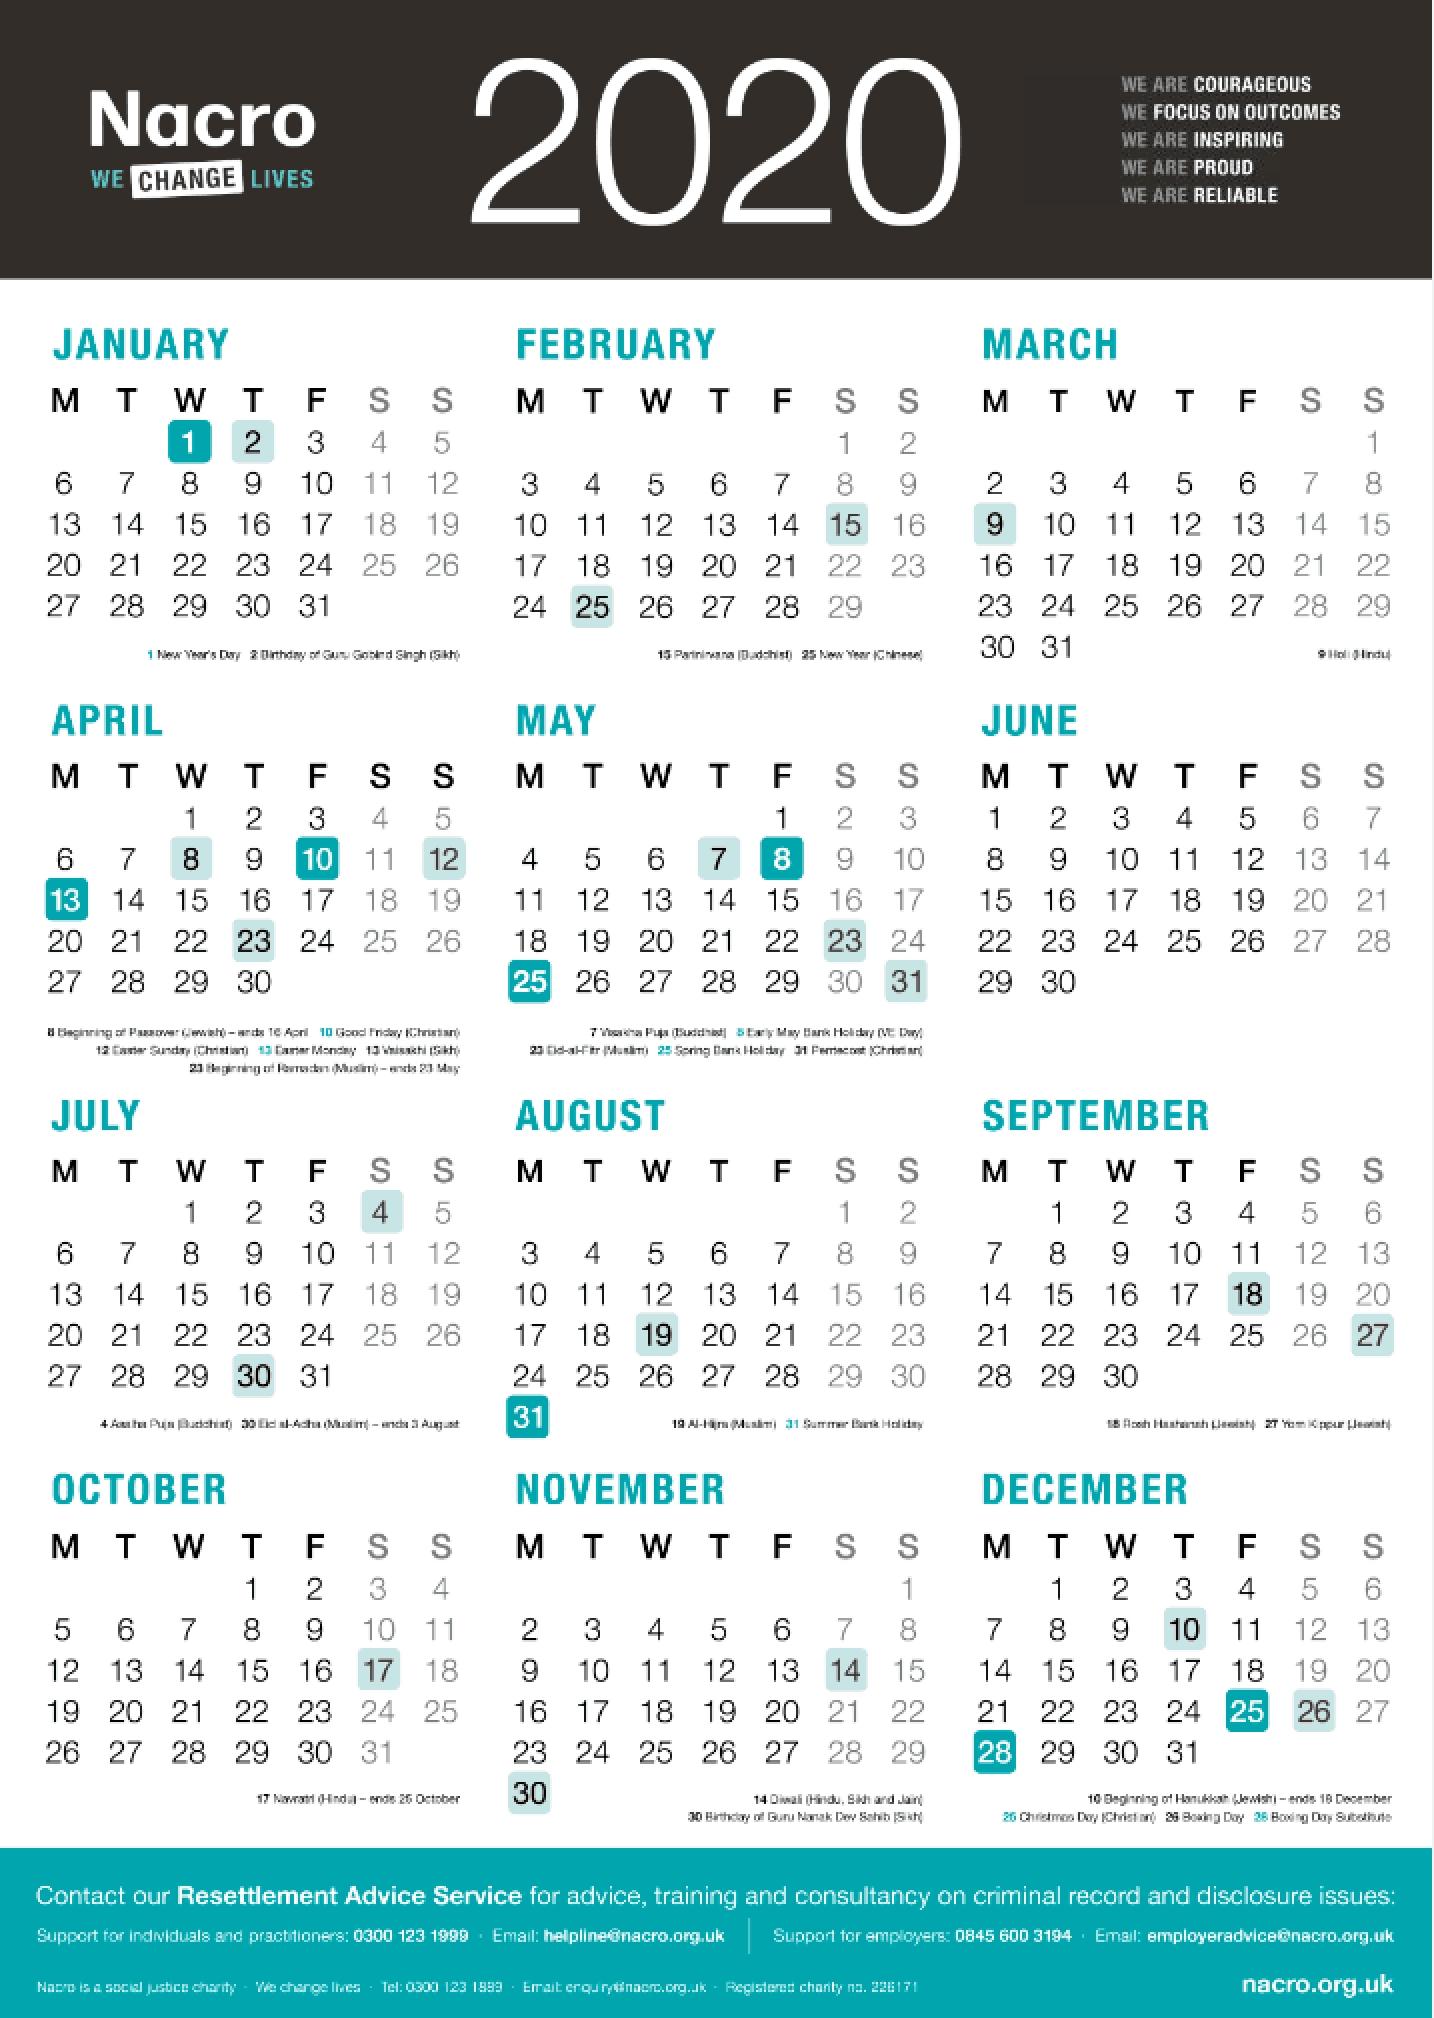 Nacro 2020 Wall Calendars Now Available To Order | Nacro